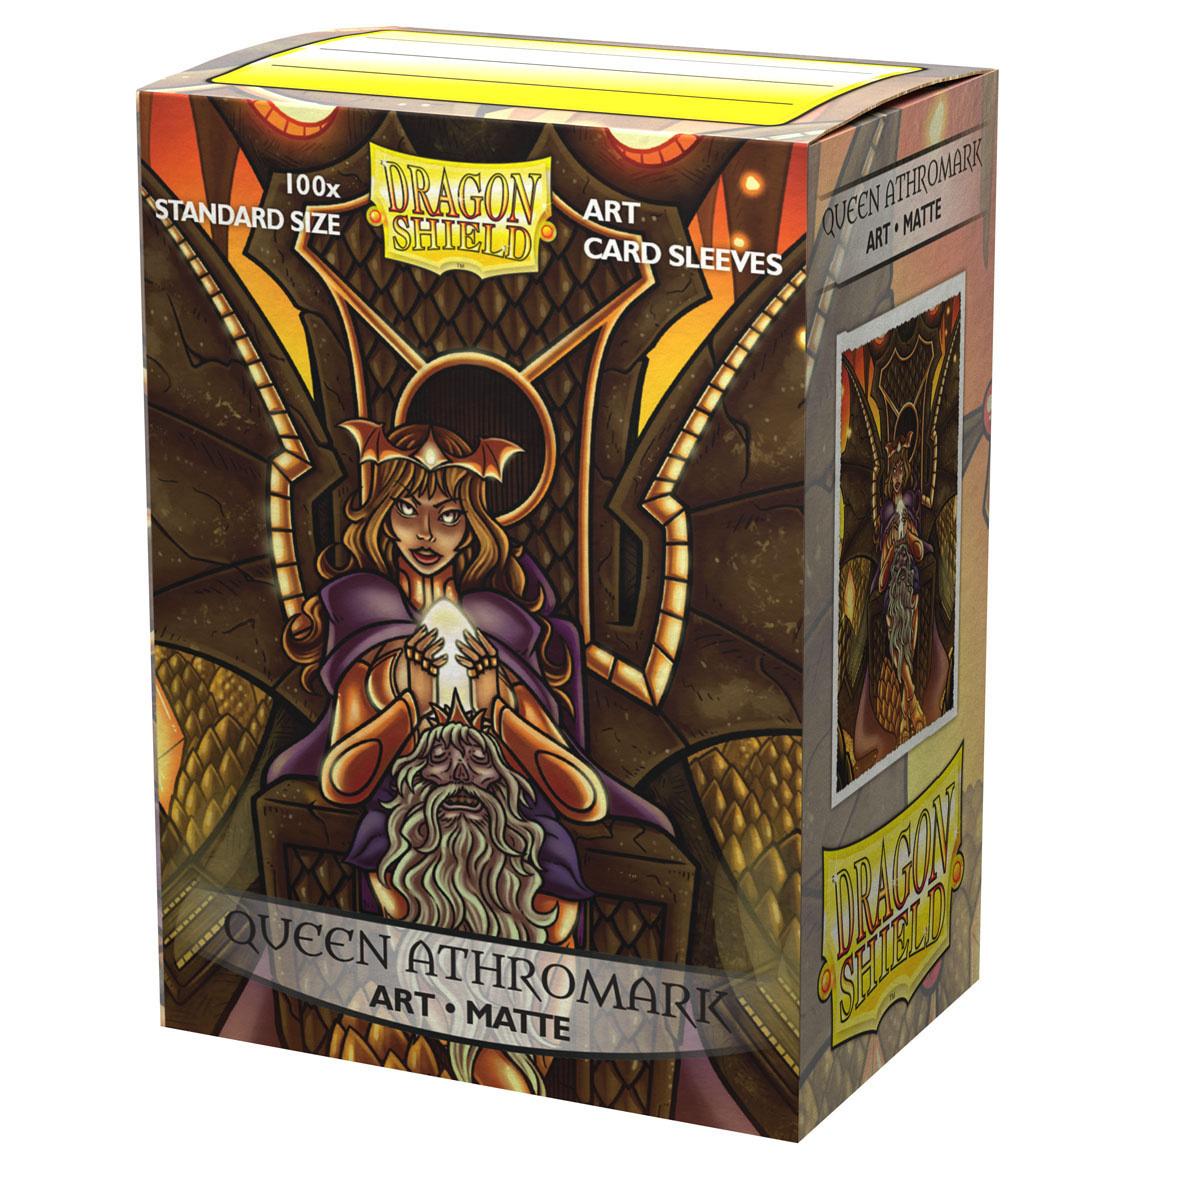 Queen Athromark Portrait Dragon Shield Sleeves Ltd. Ed. Matte Art 100ct